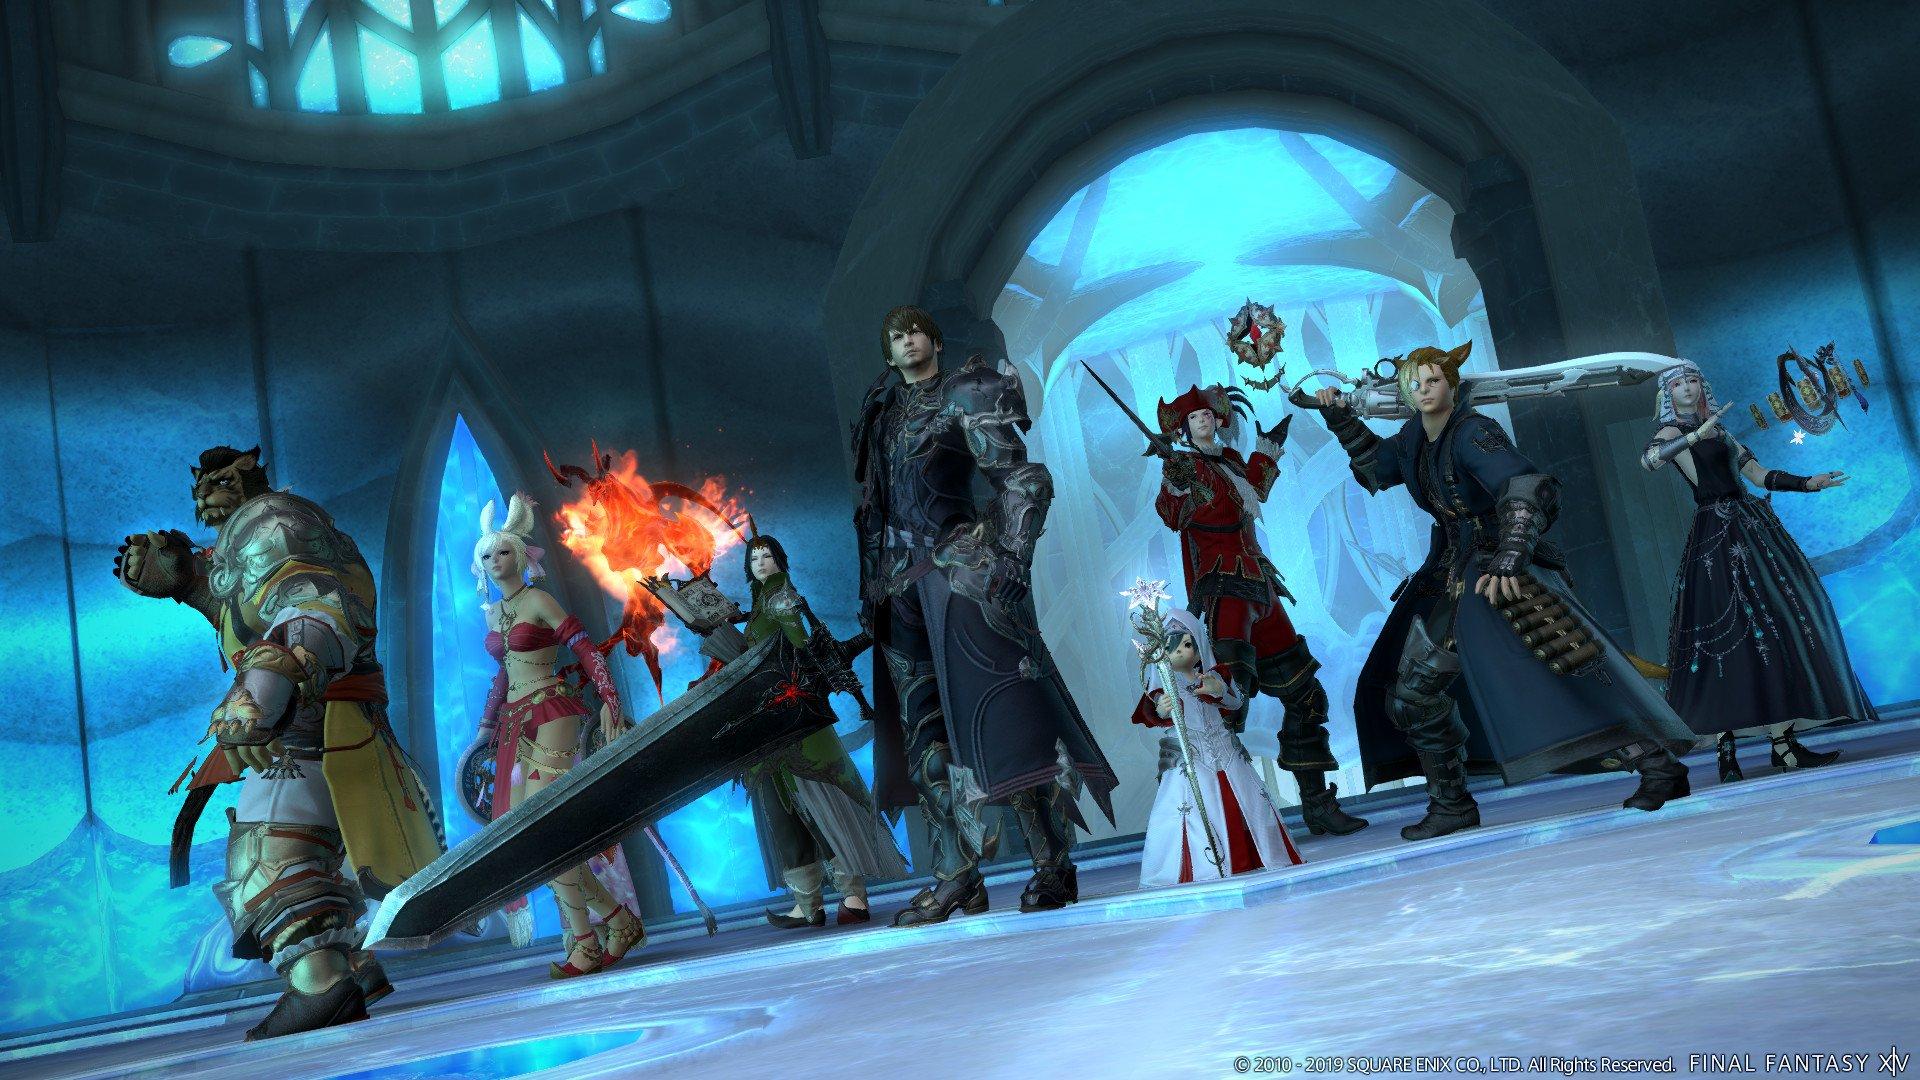 Final Fantasy 14: Shadowbringers Dohn Mheg dungeon gameplay | Shacknews